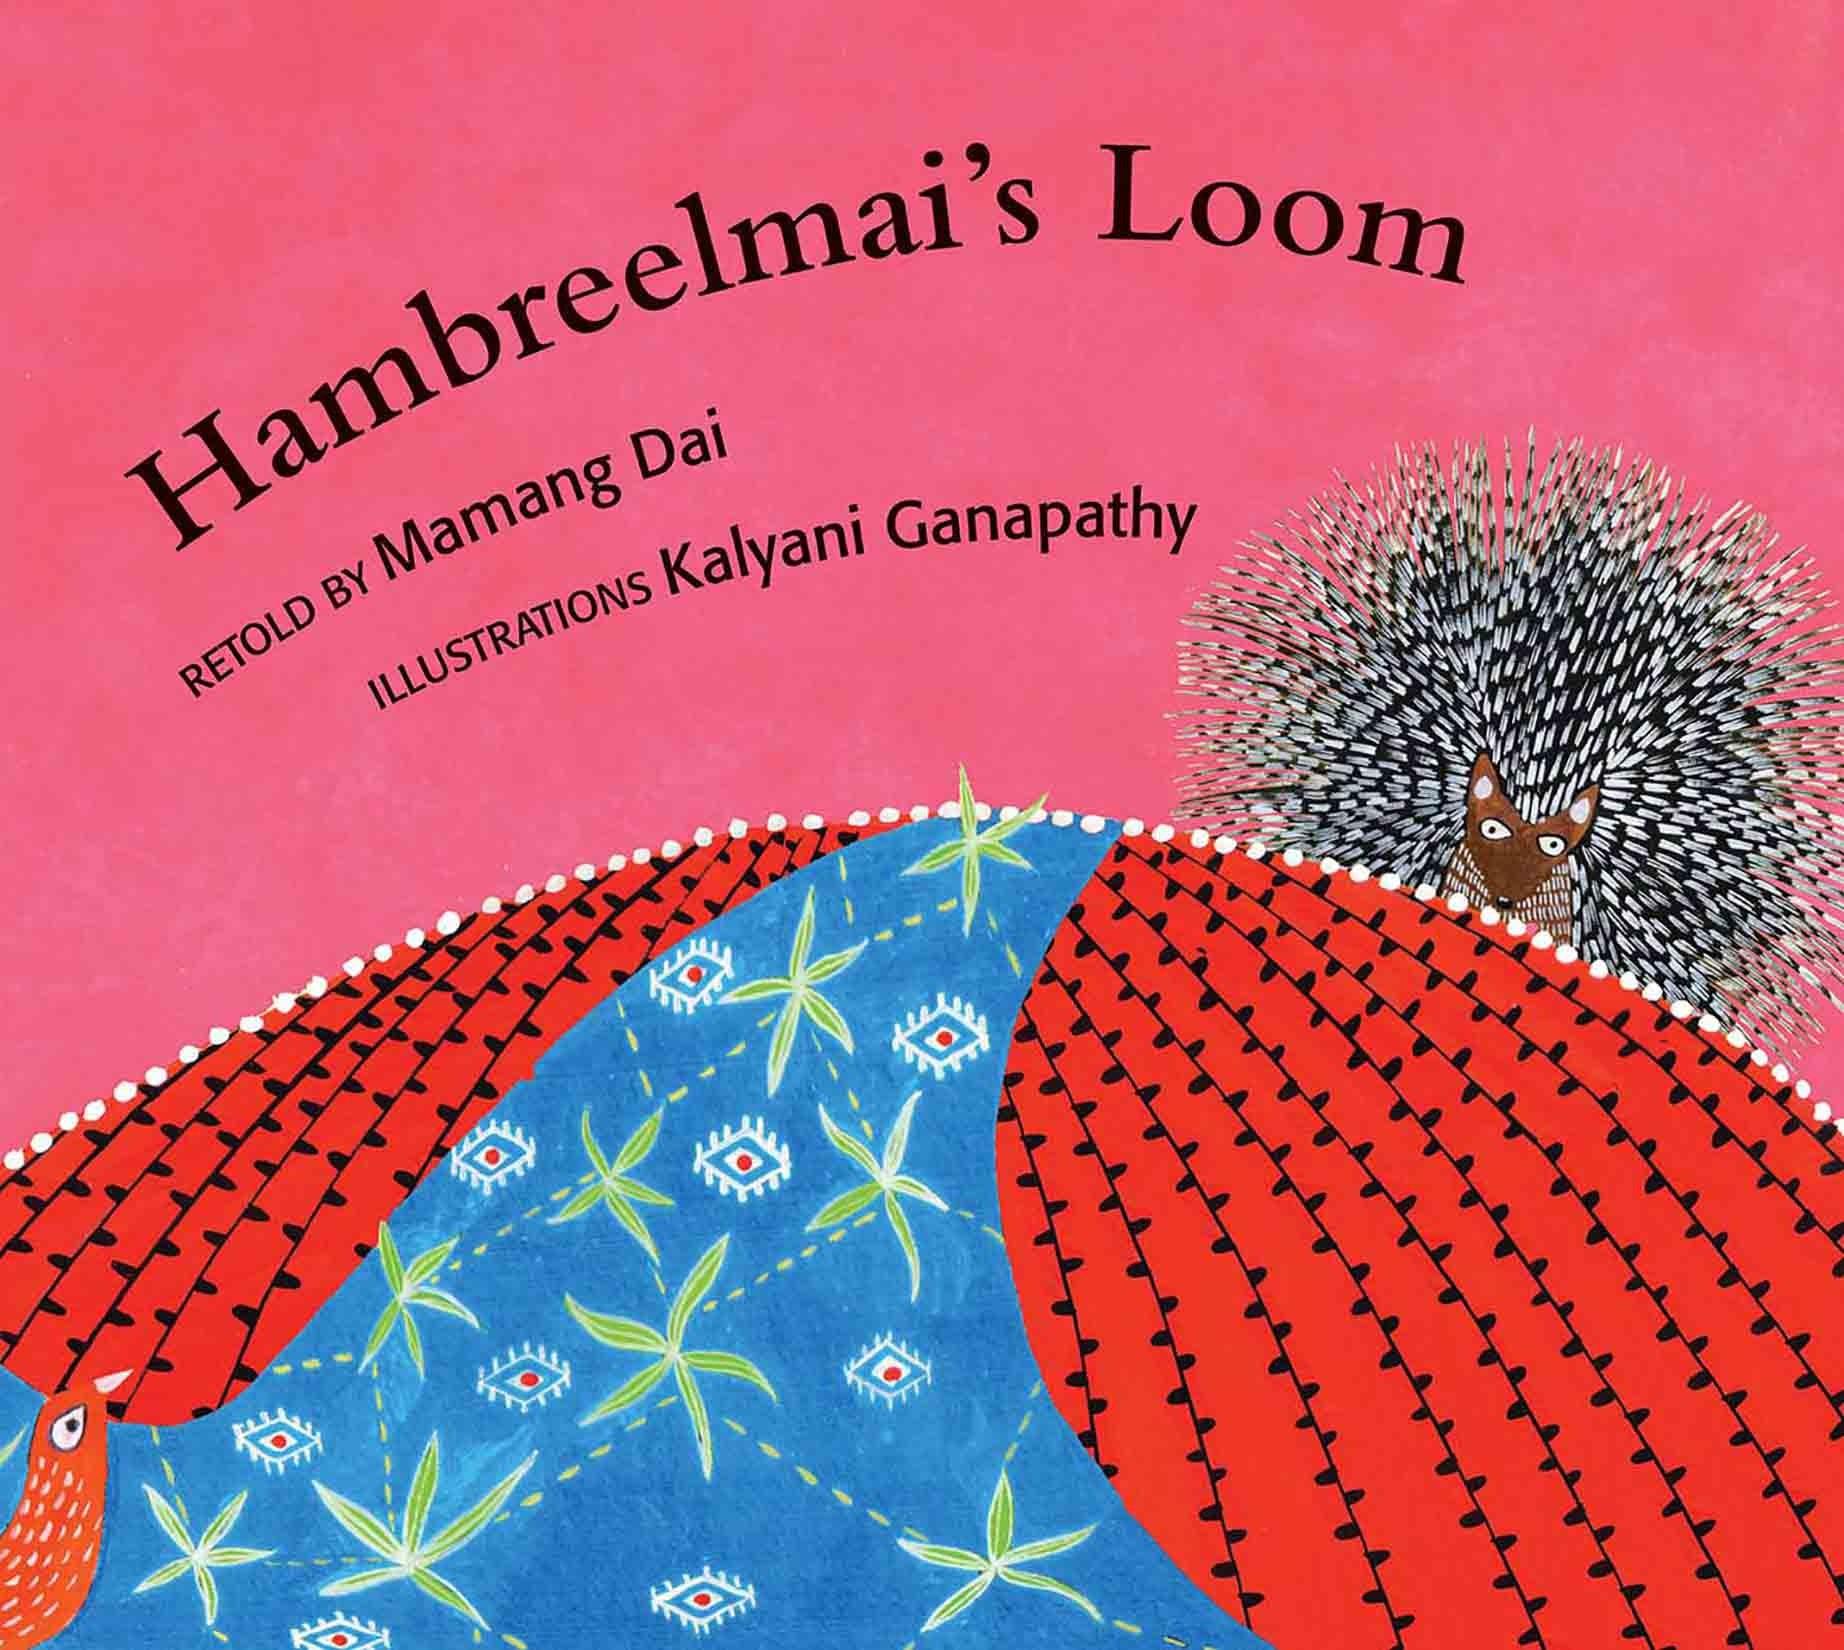 Hambreelmai's Loom (English)